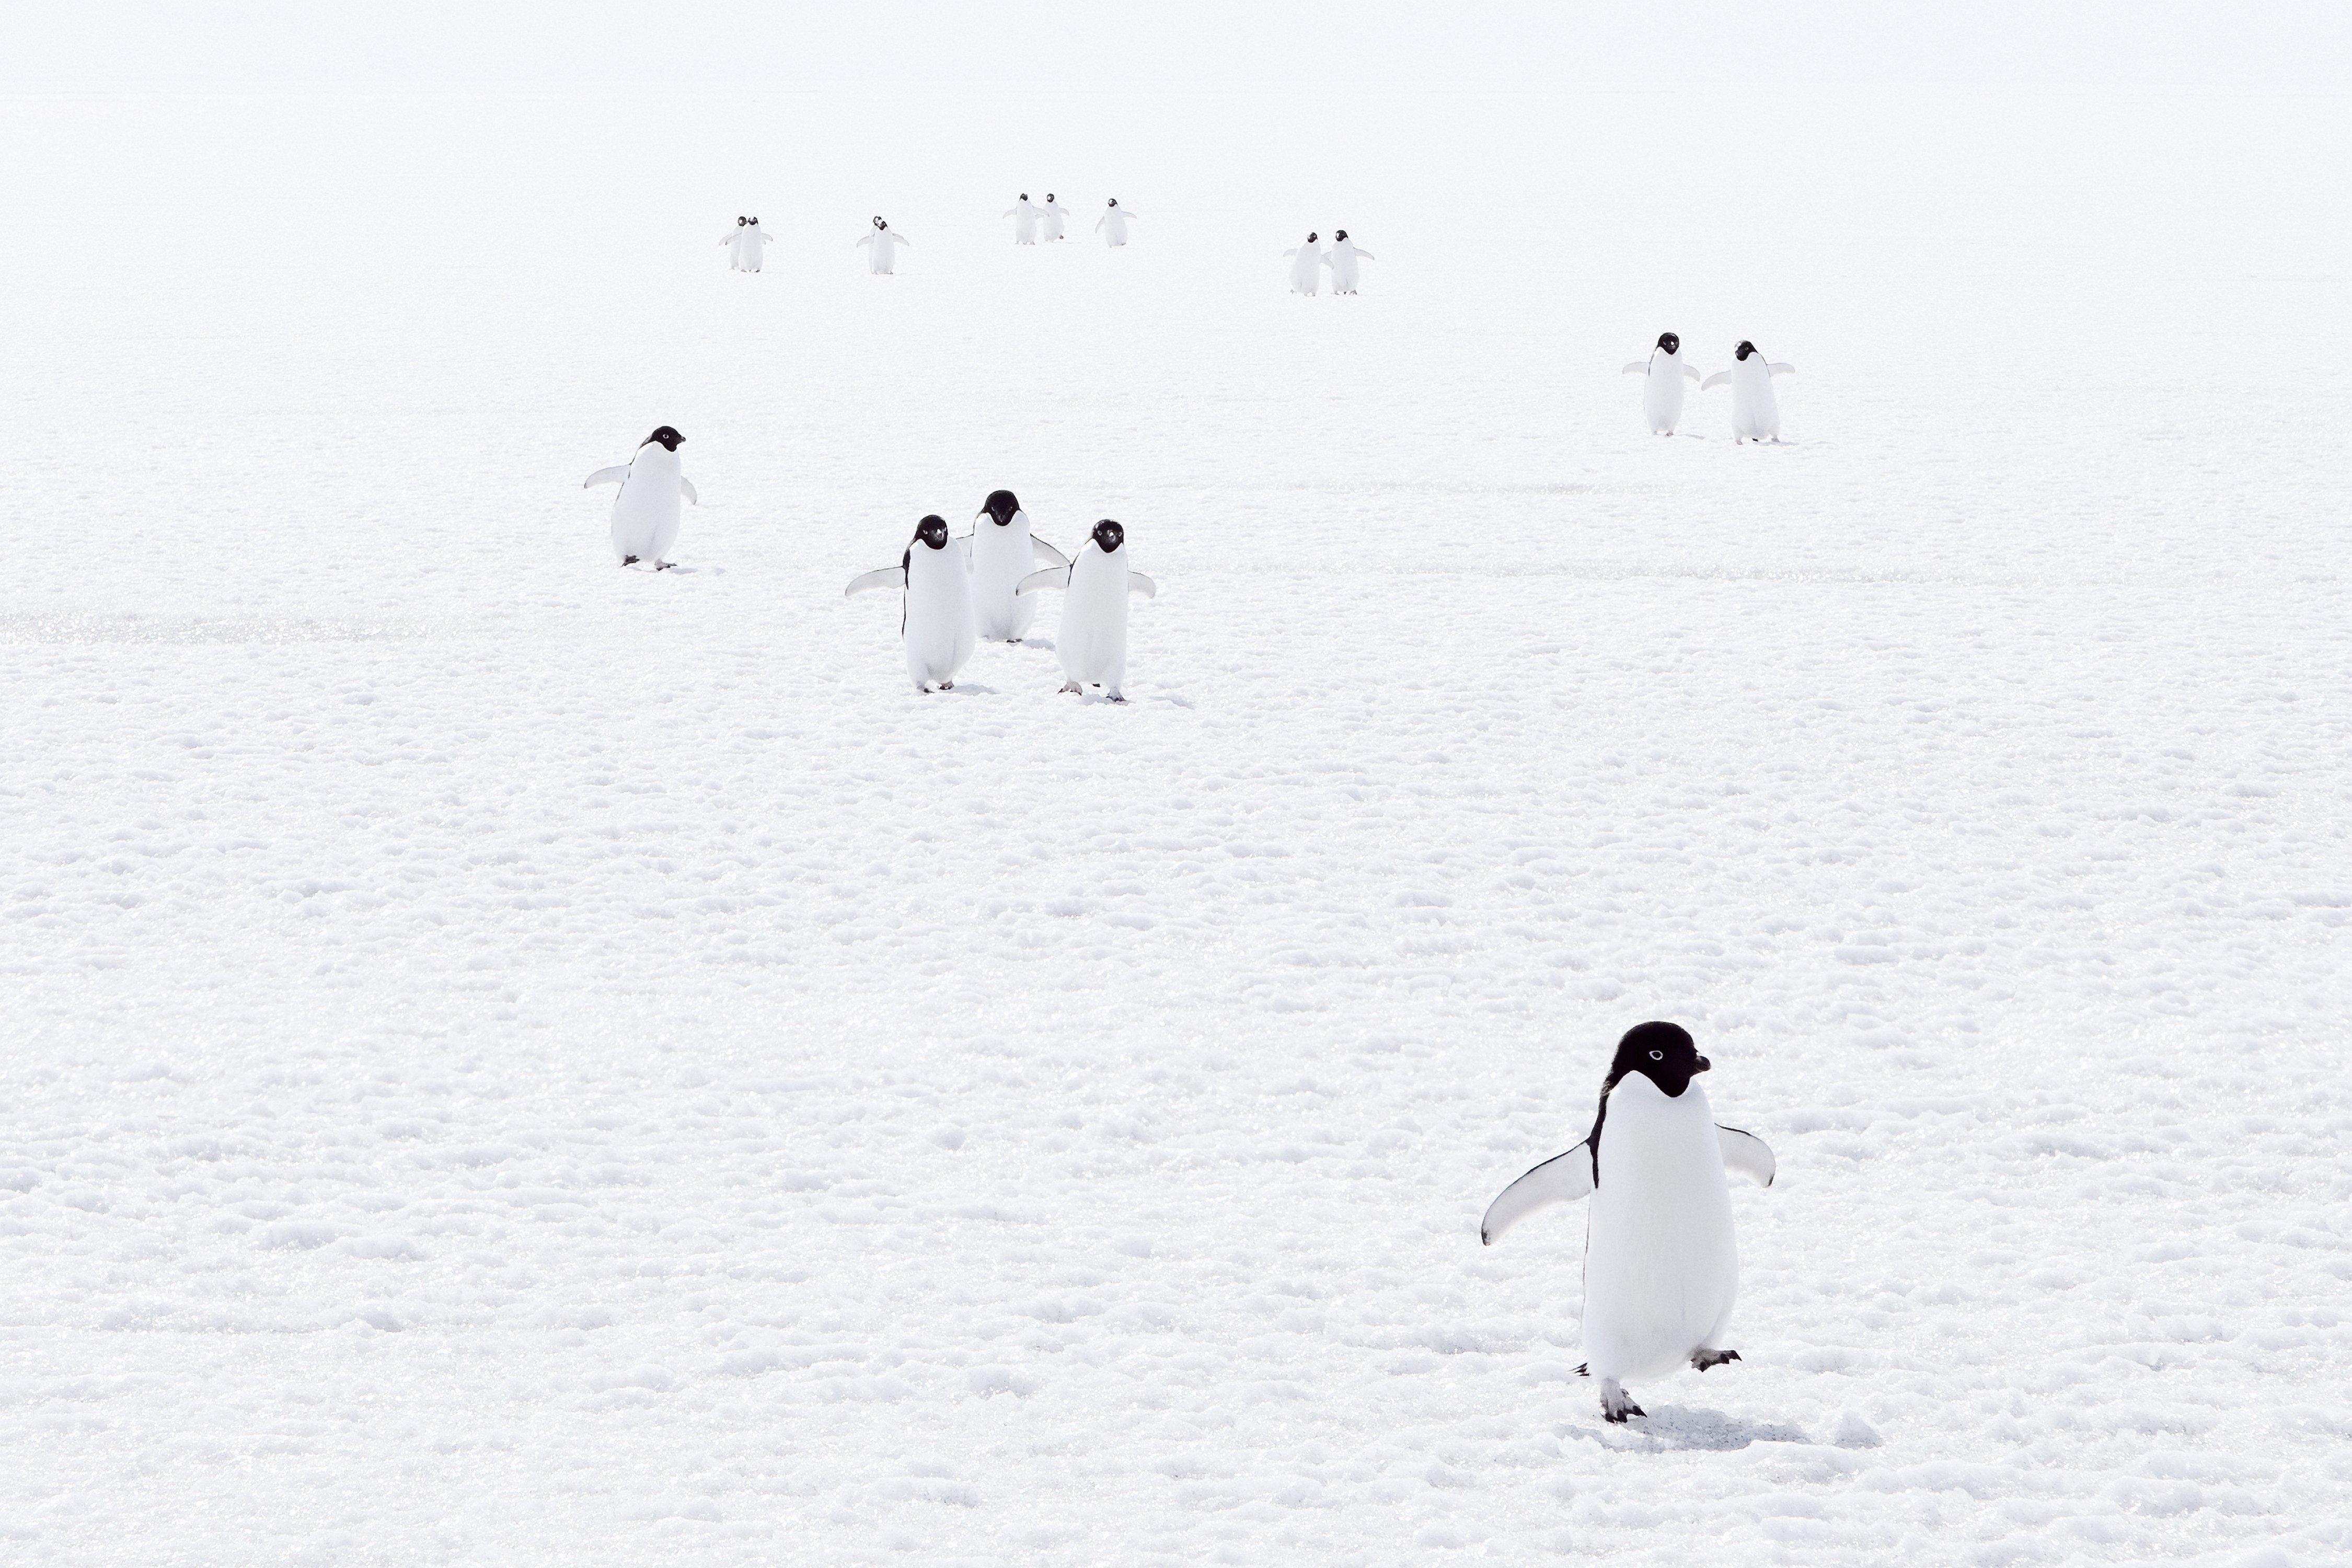 Watch the penguins perform_Credit John Weller